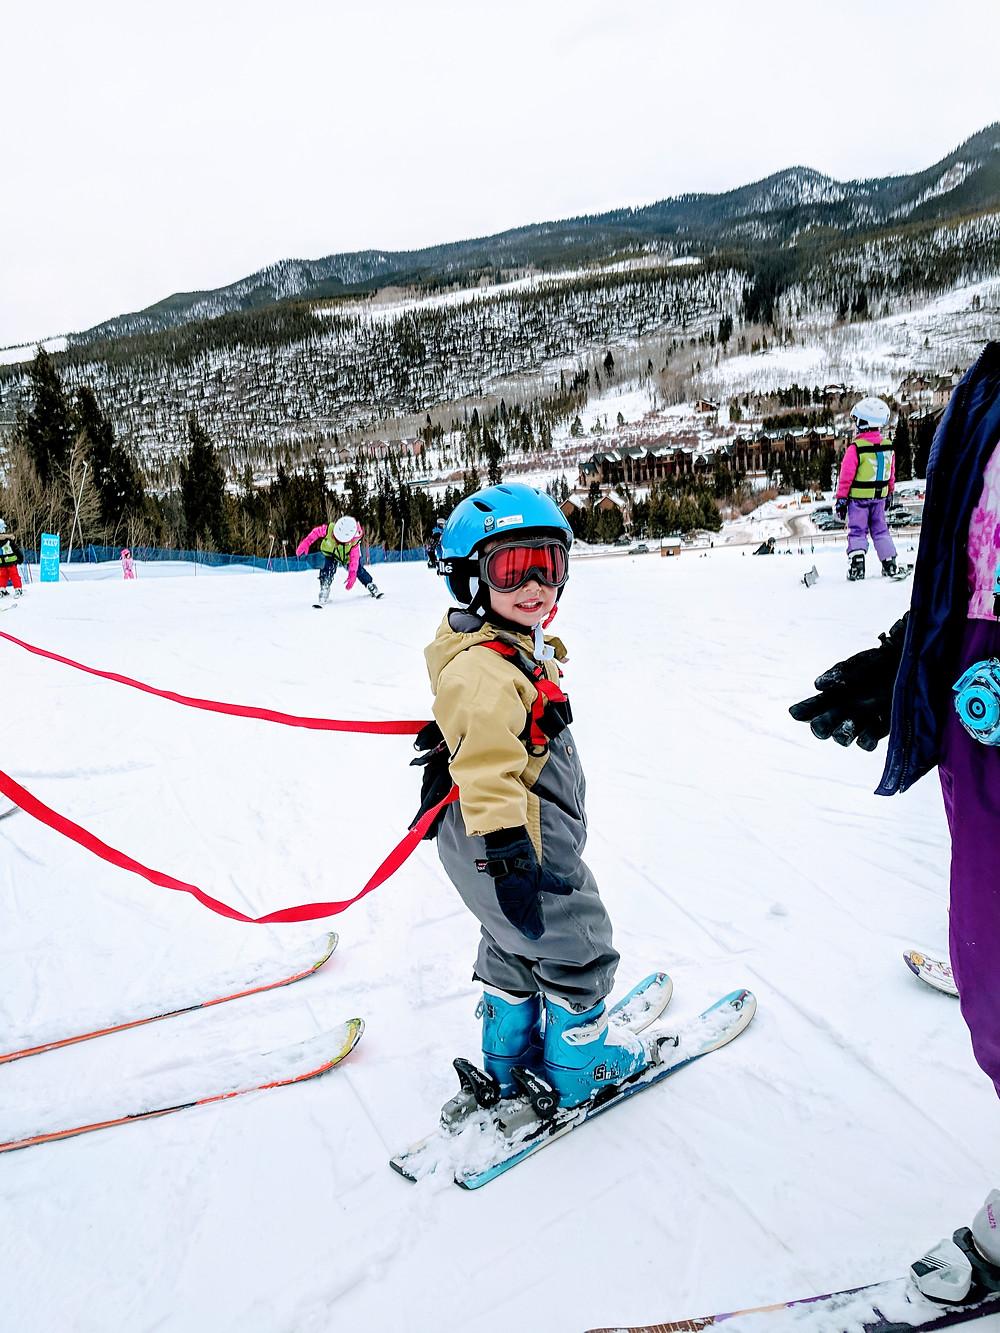 Child skiing at ski resort with harness